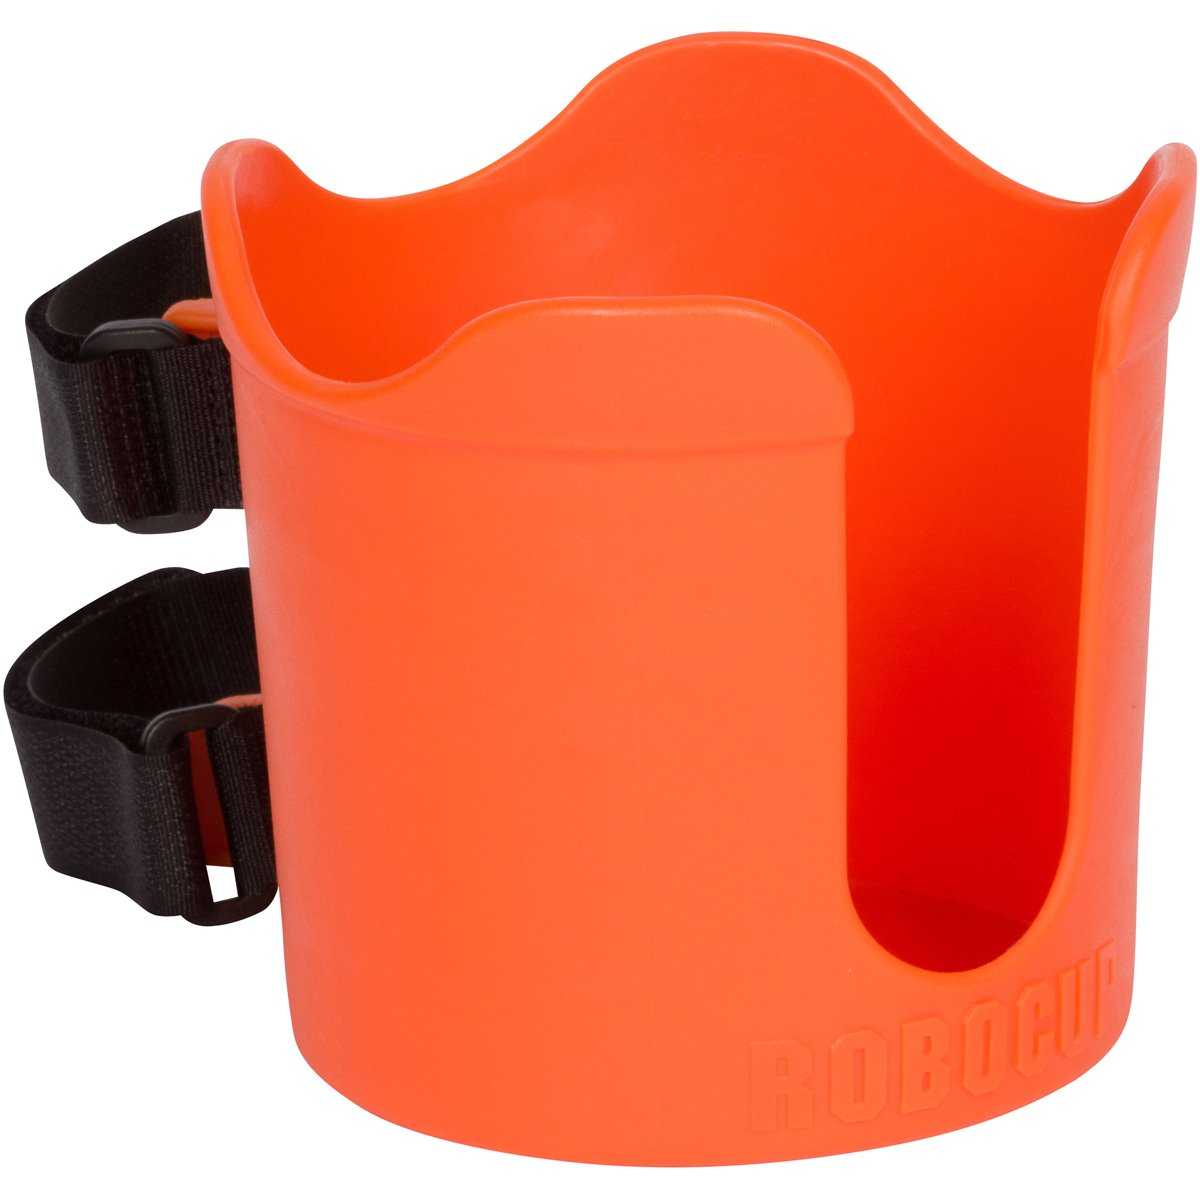 Orange RoboCup Plus